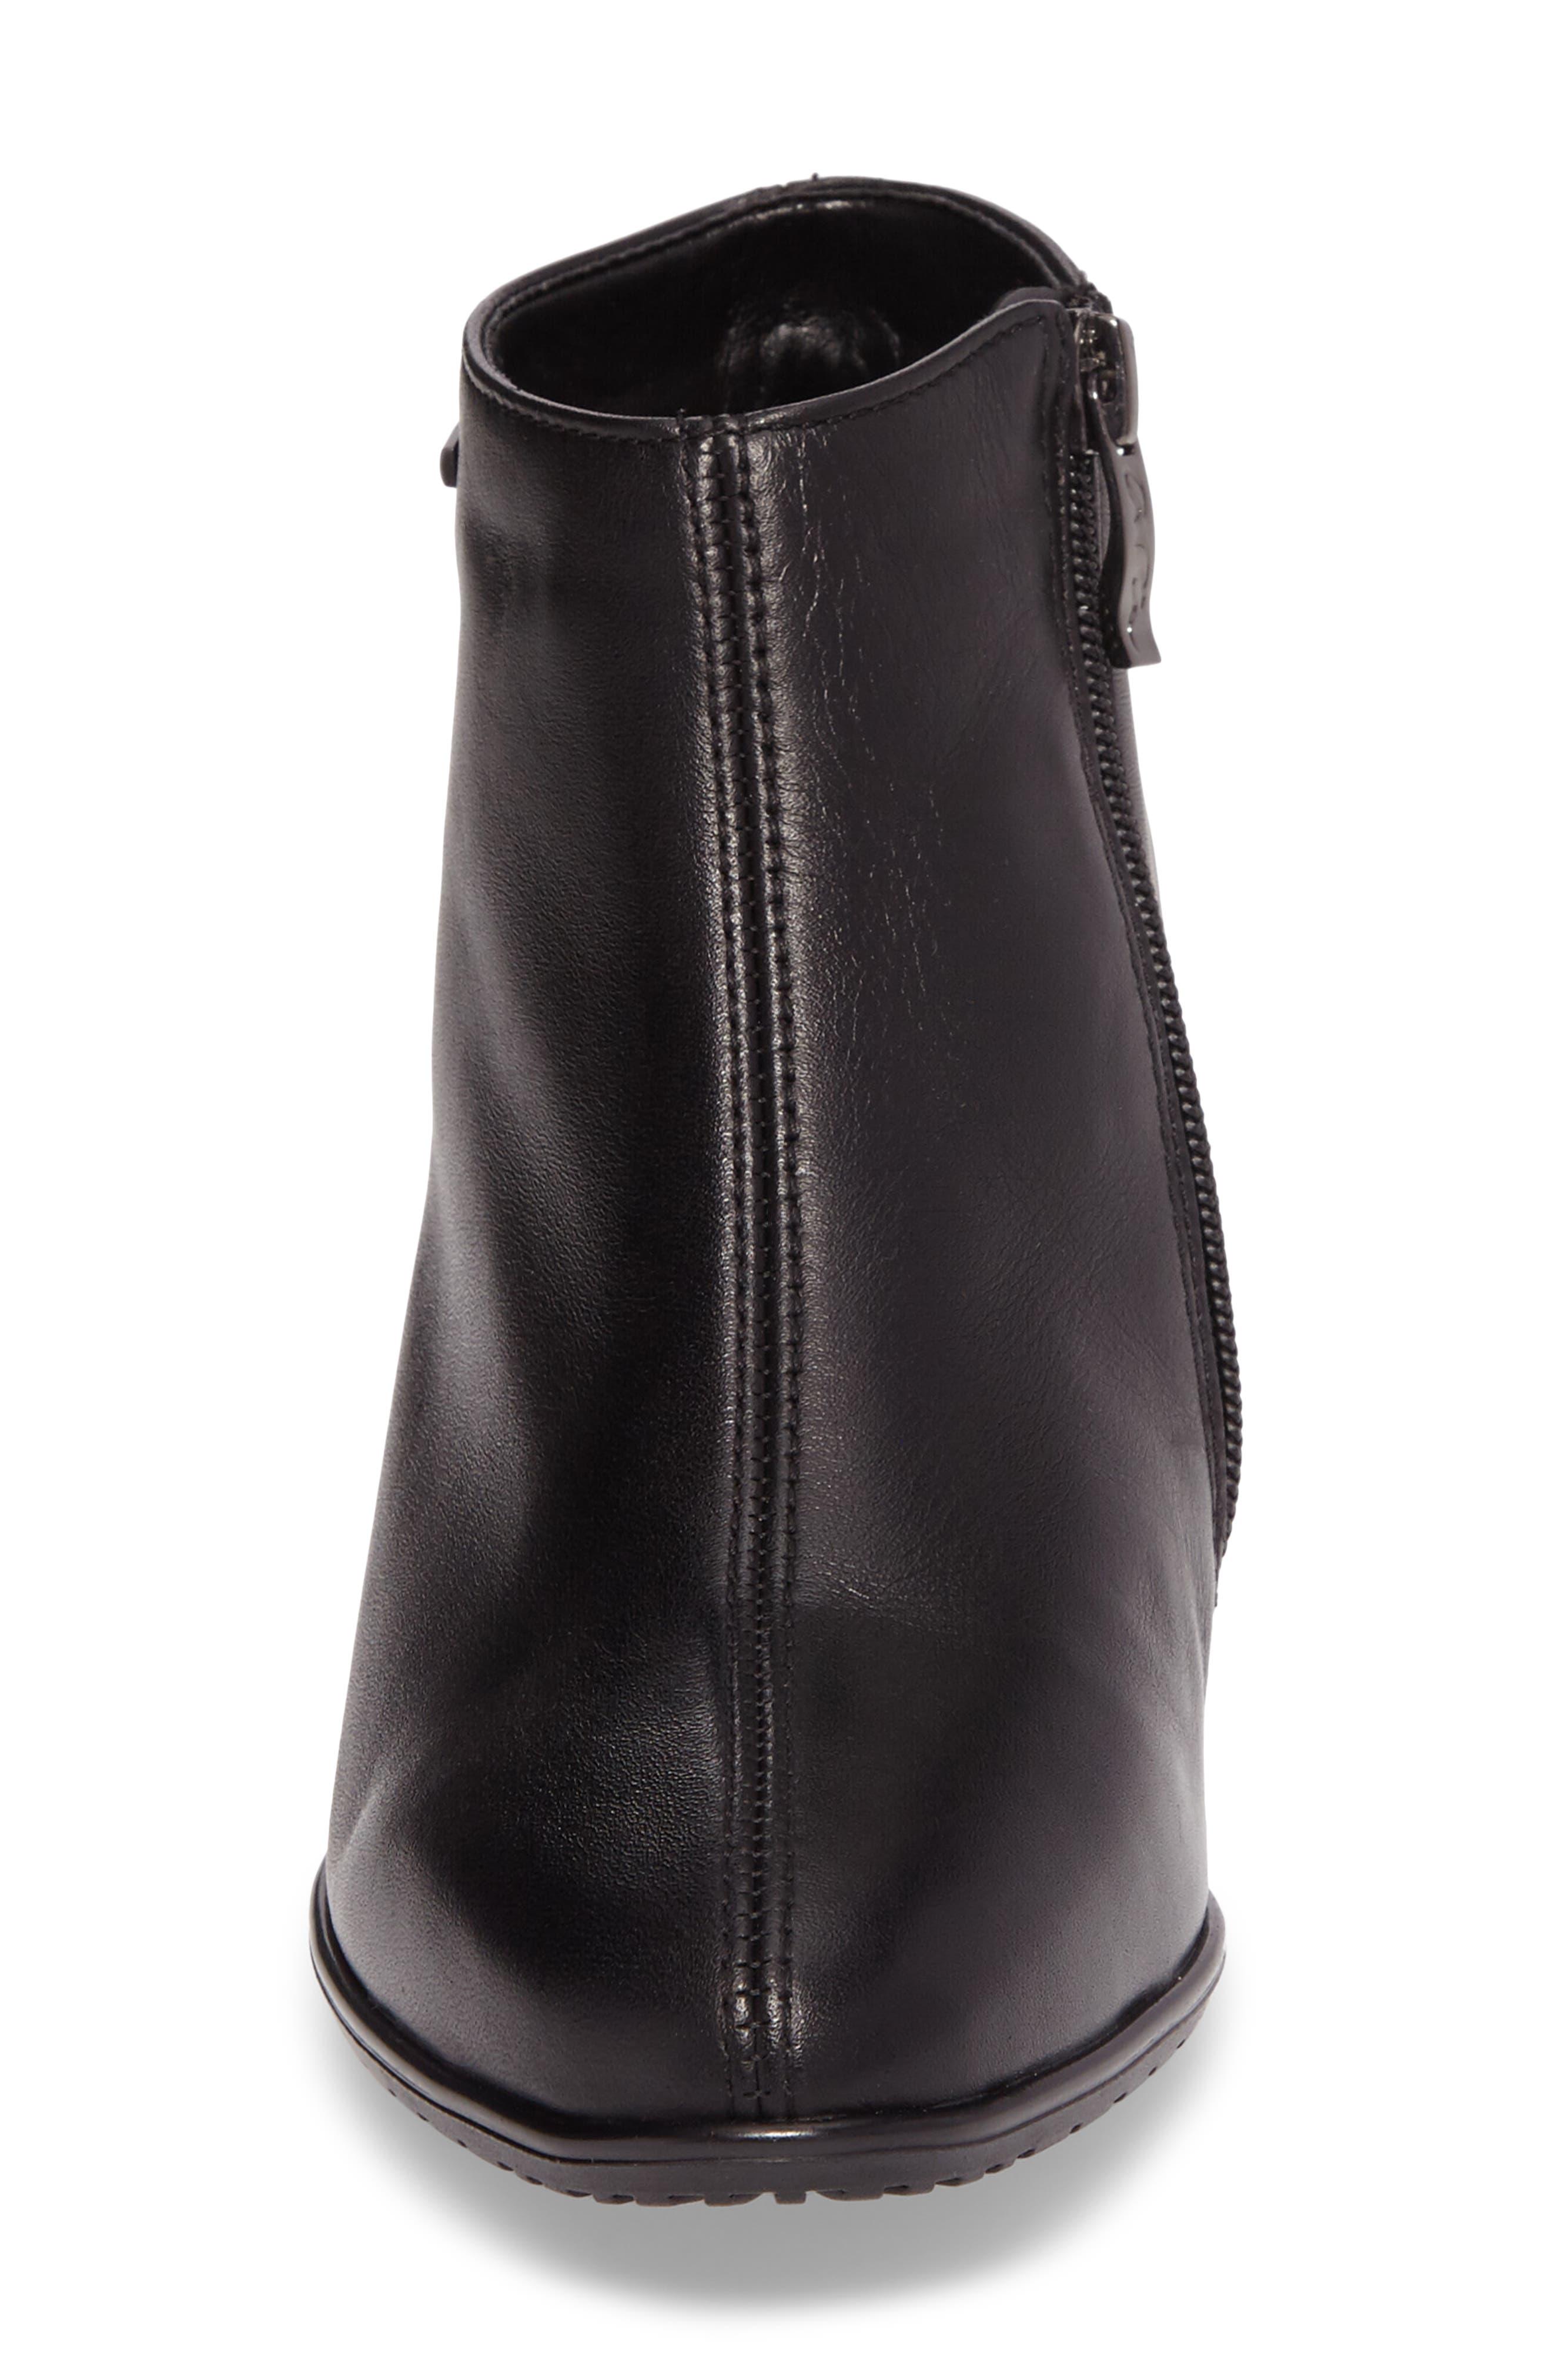 Prisha Waterproof Gore-Tex<sup>®</sup> Bootie,                             Alternate thumbnail 4, color,                             Black Leather